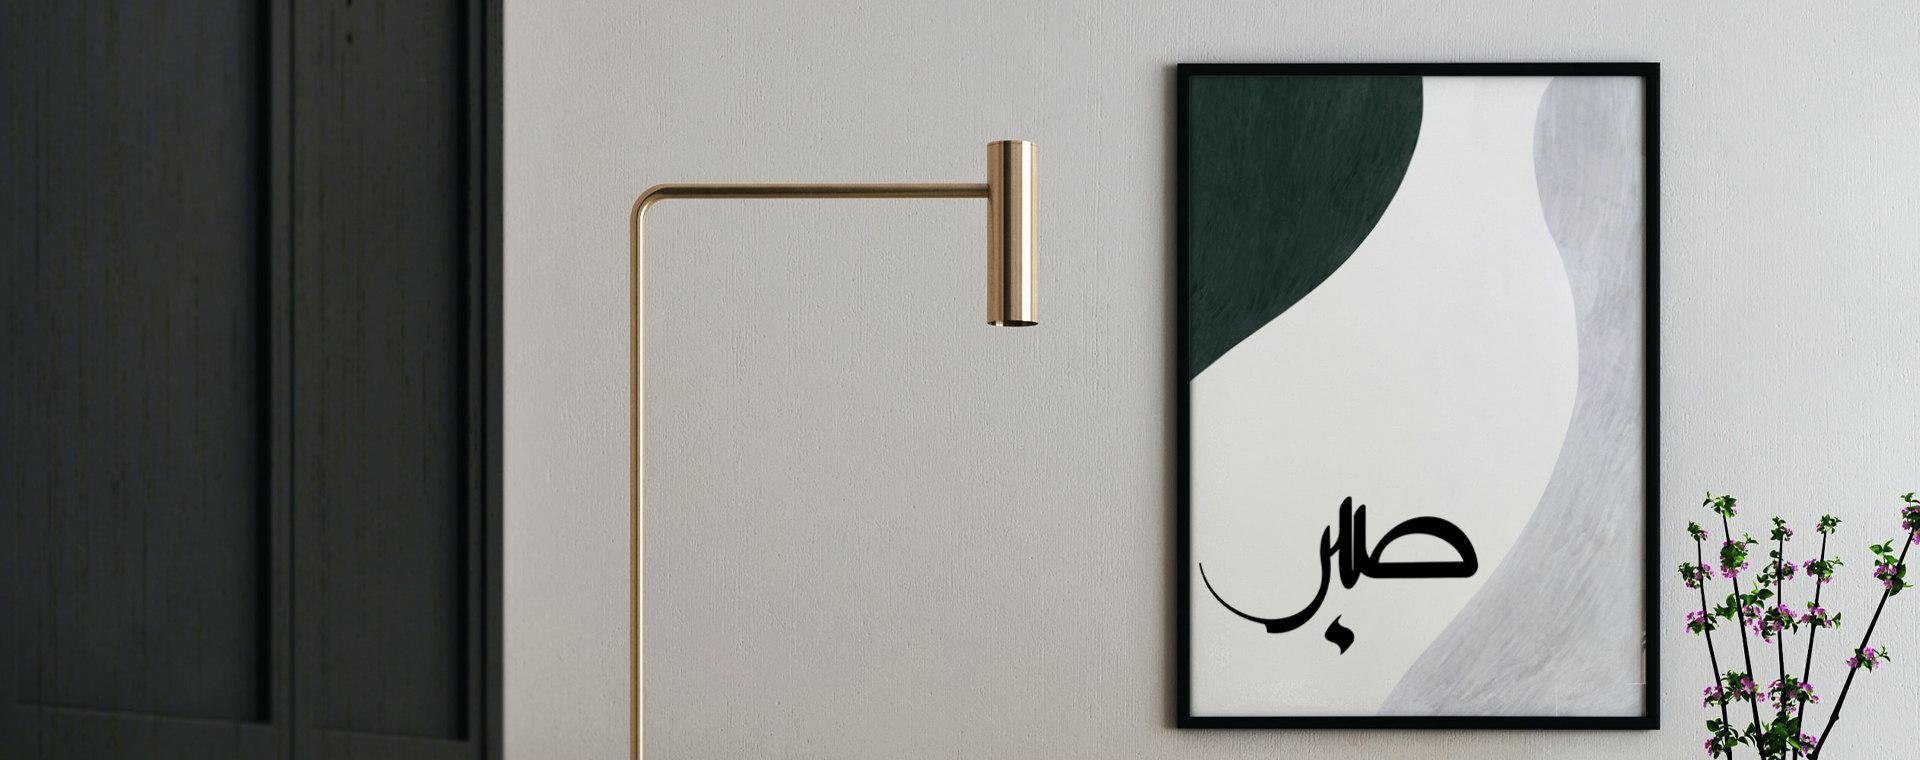 Sabr canvas hanging in contemporary room